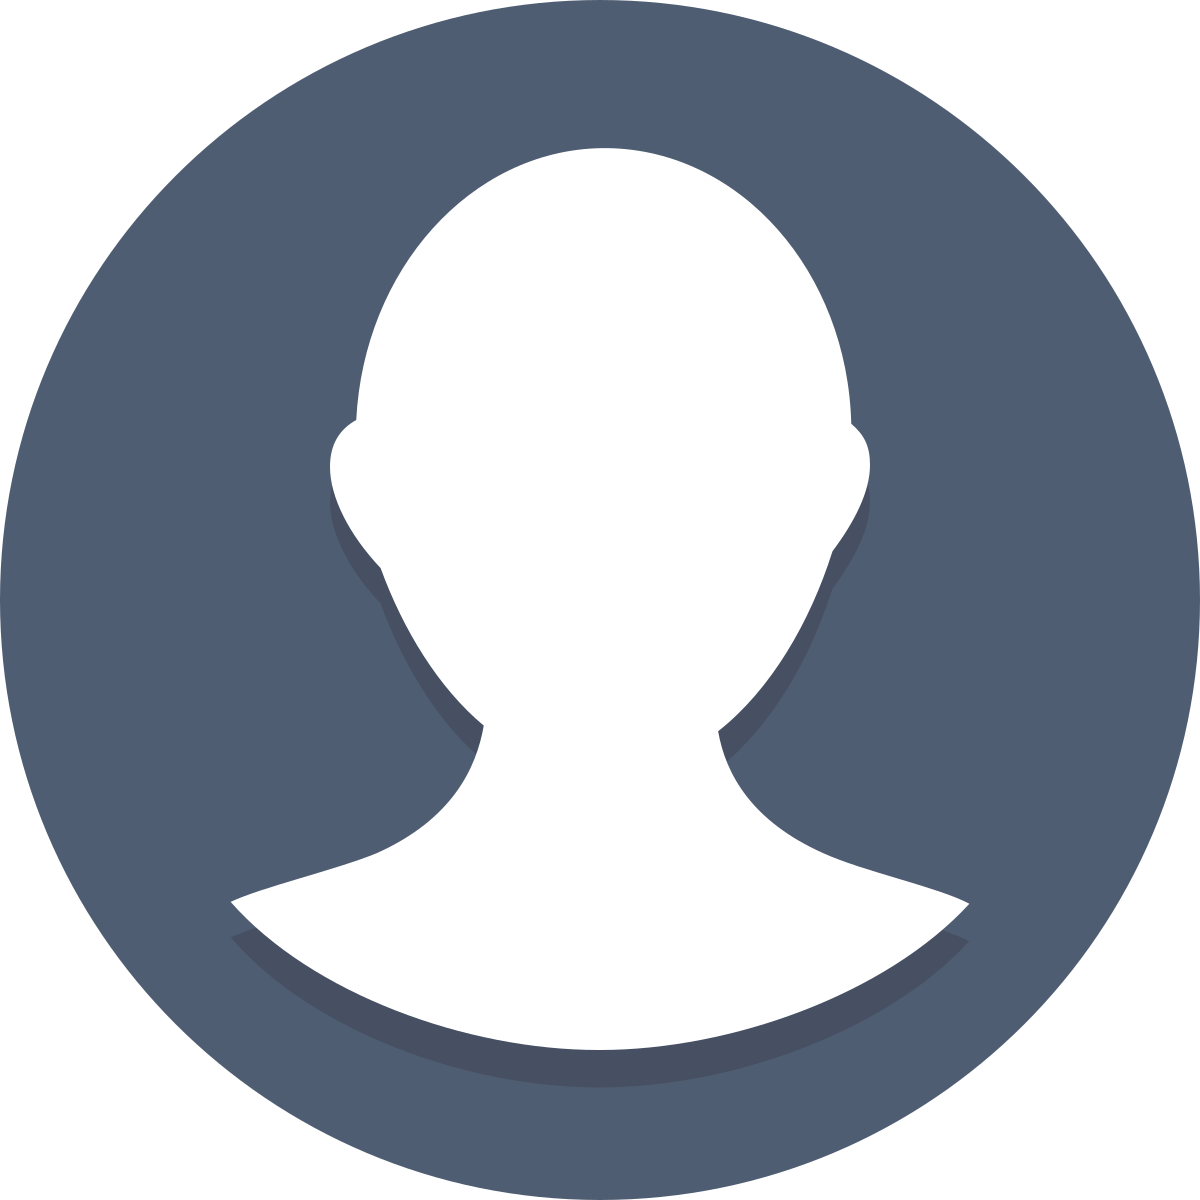 heyko profile